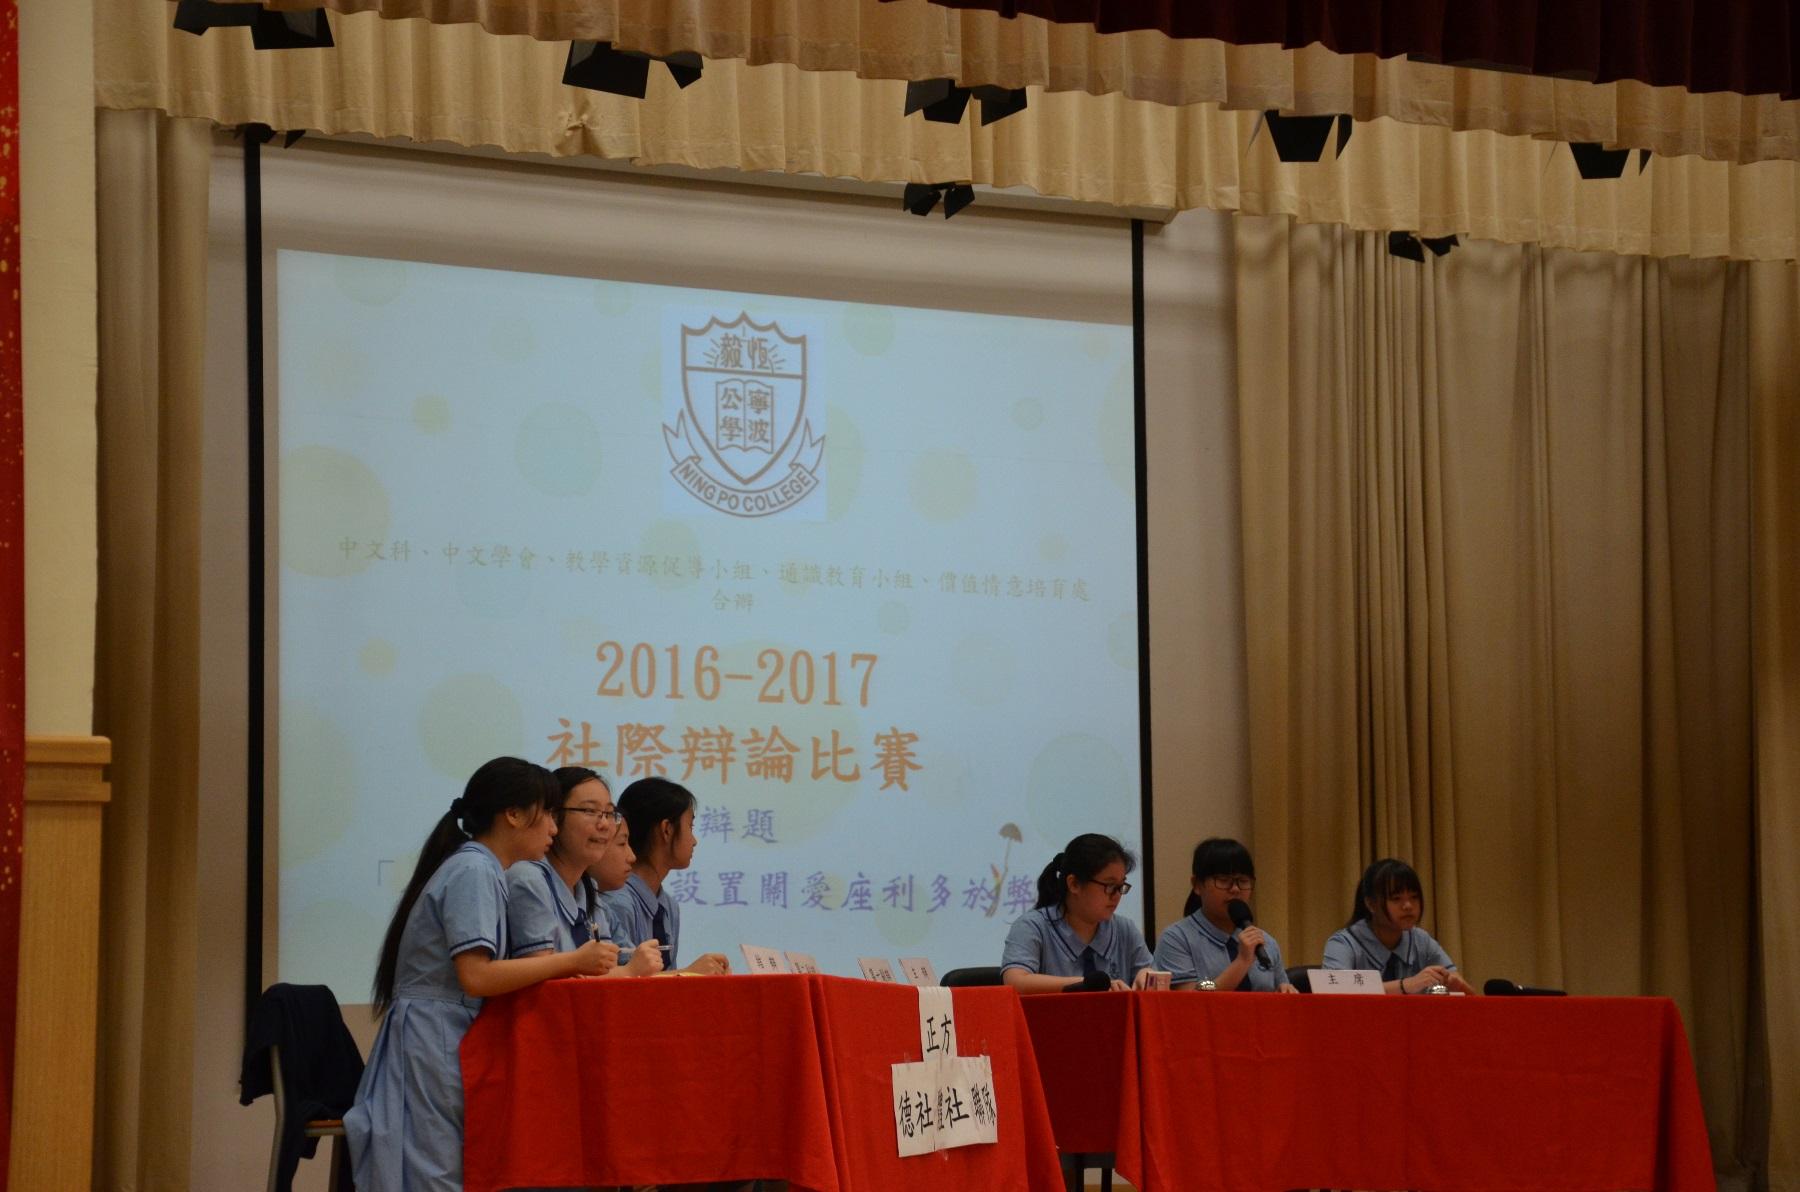 http://www.npc.edu.hk/sites/default/files/dsc_6769.jpg